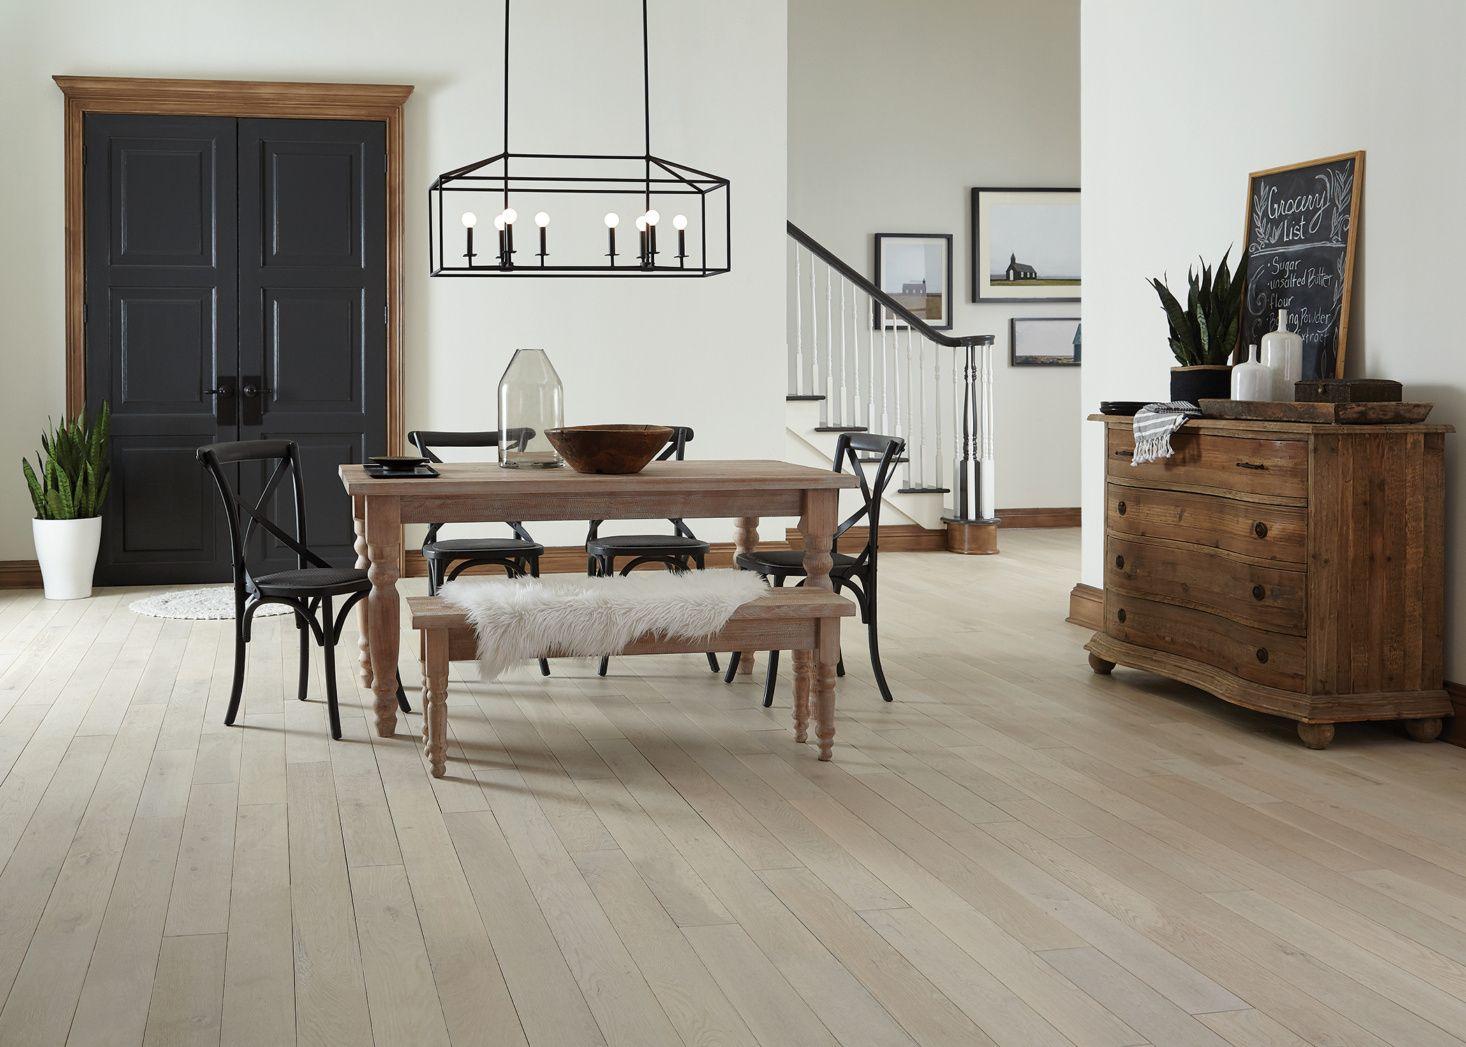 Deal Alert Quality On Trend Flooring On Sale Now From Lumber Liquidators In 2020 Solid Hardwood Floors Lumber Liquidators Flooring Lumber Liquidators